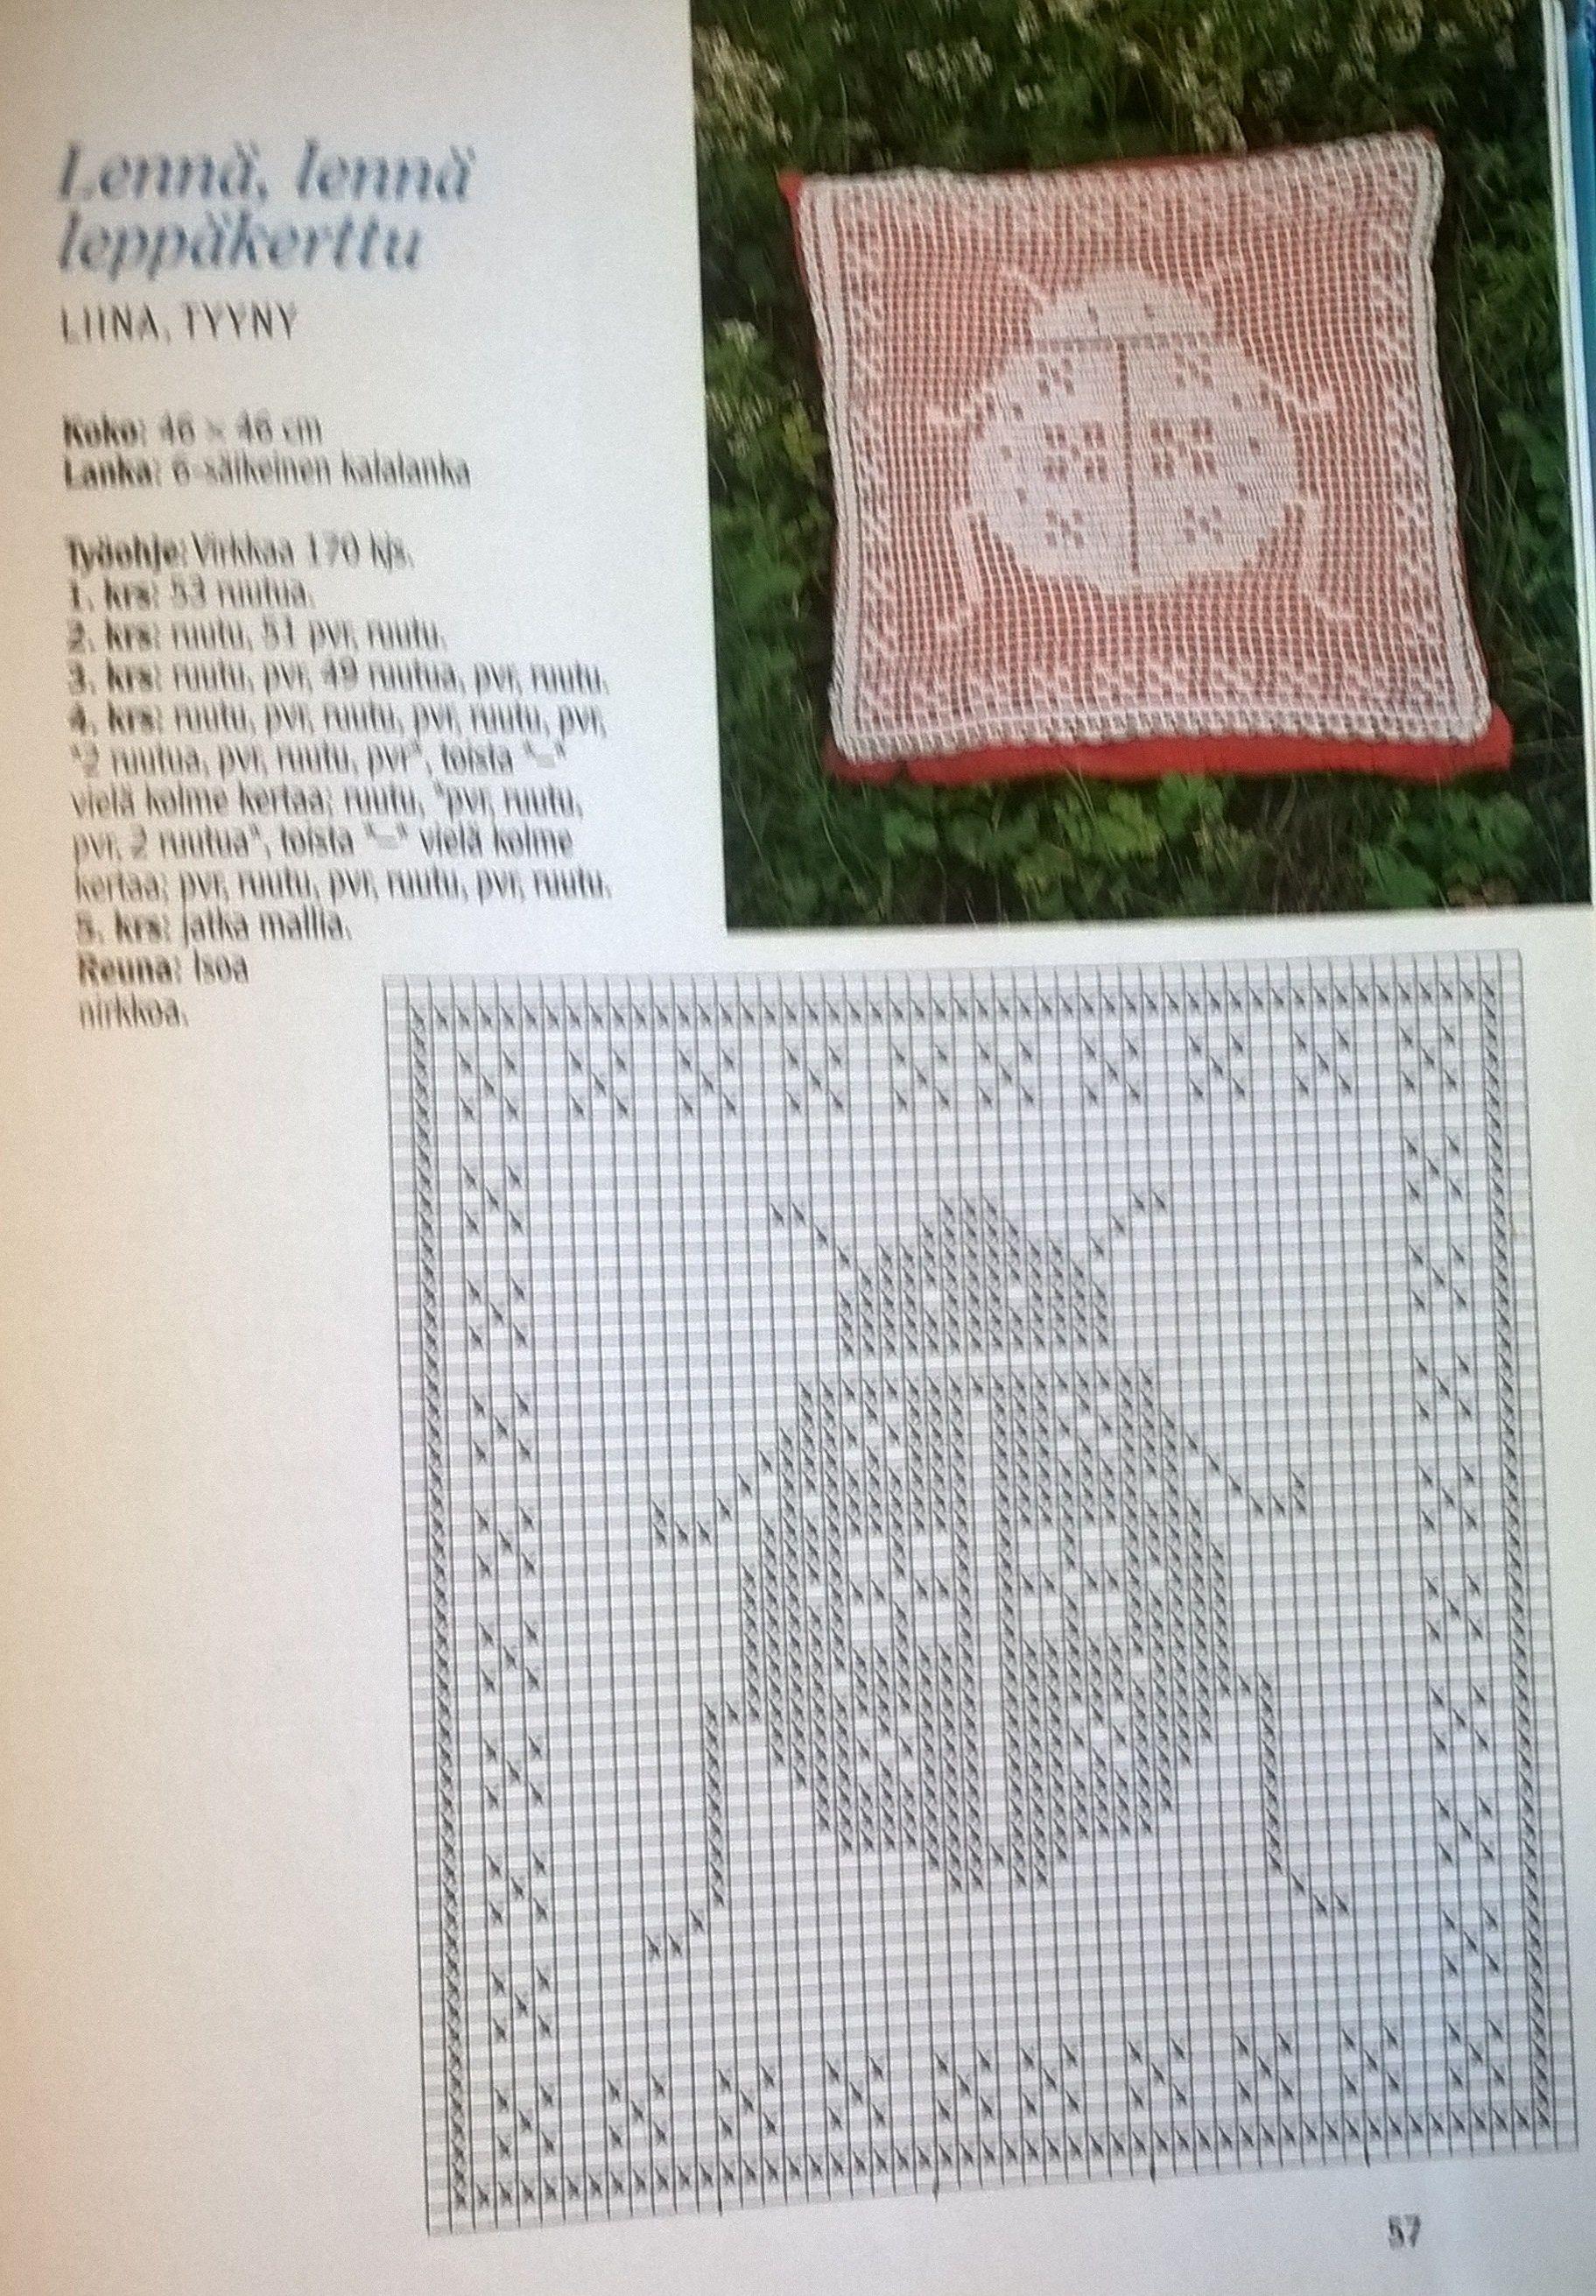 Pin de stefanie boye en crochet cuadrado   Pinterest   Ganchillo y ...